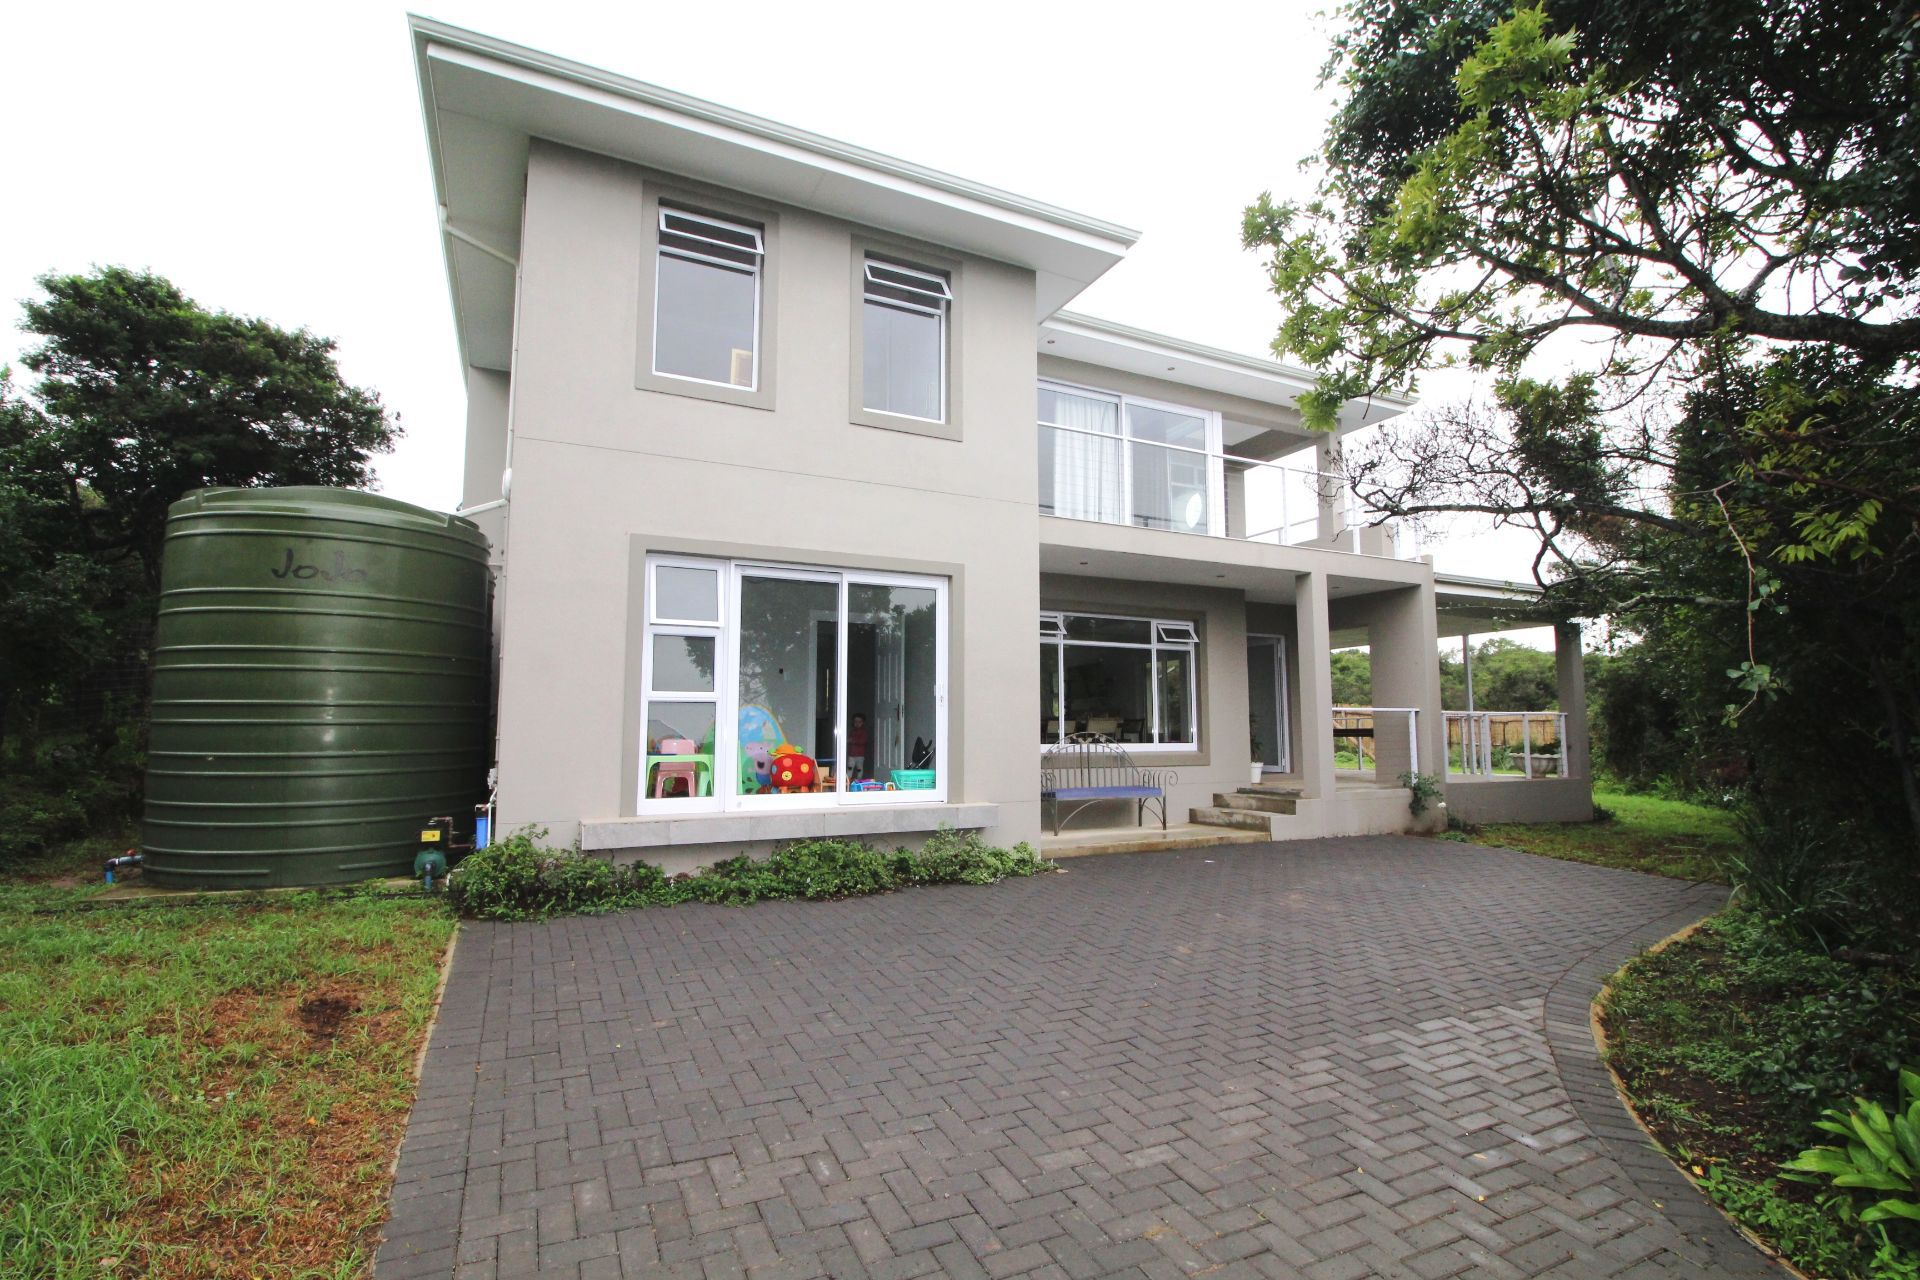 , House, 3 Bedrooms - ZAR , 15,00*,M